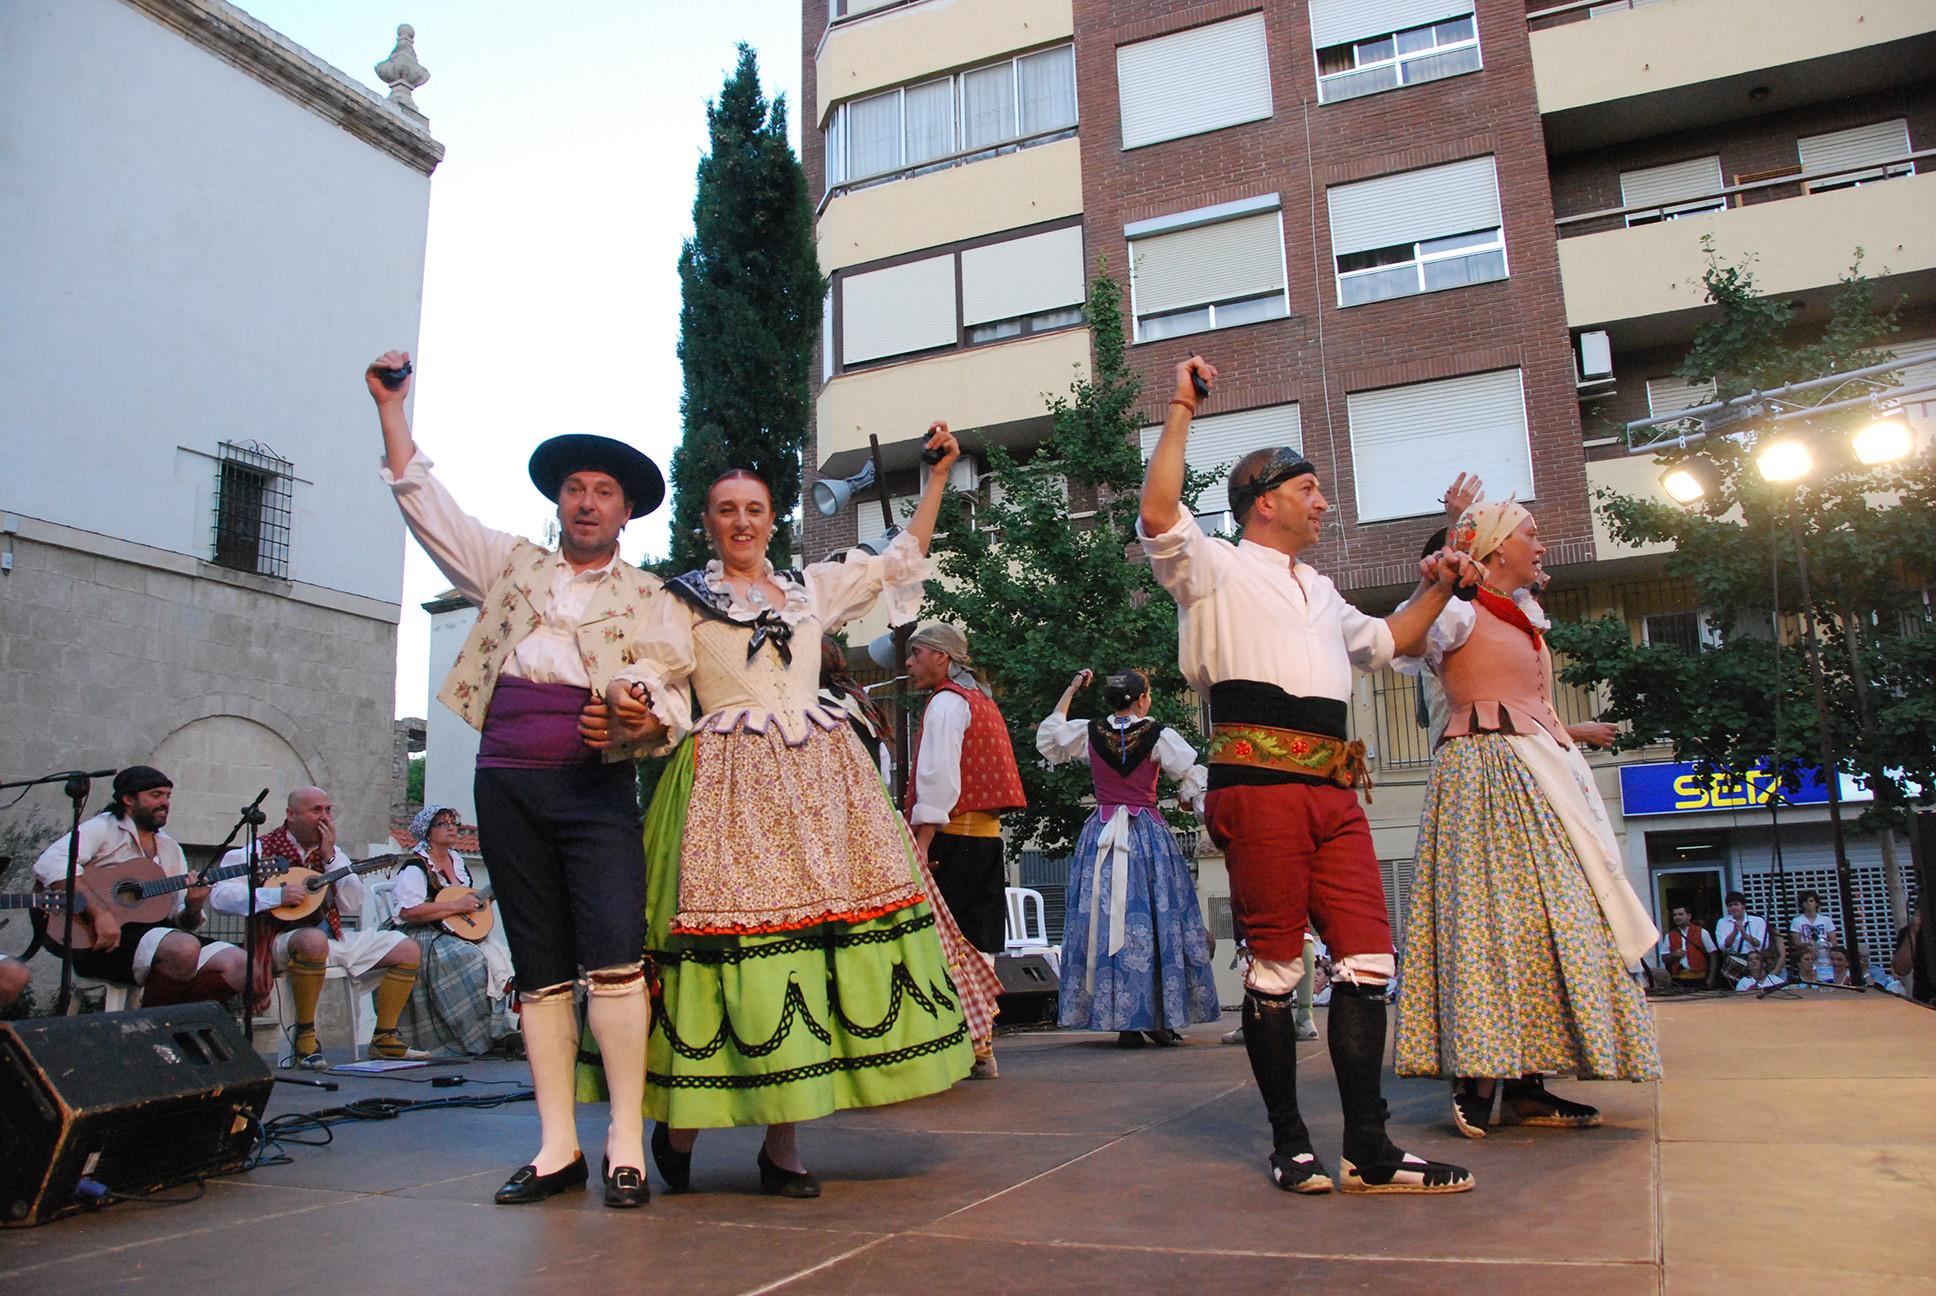 Baladre-FestaMajorDenia 07-07-2013 (120)